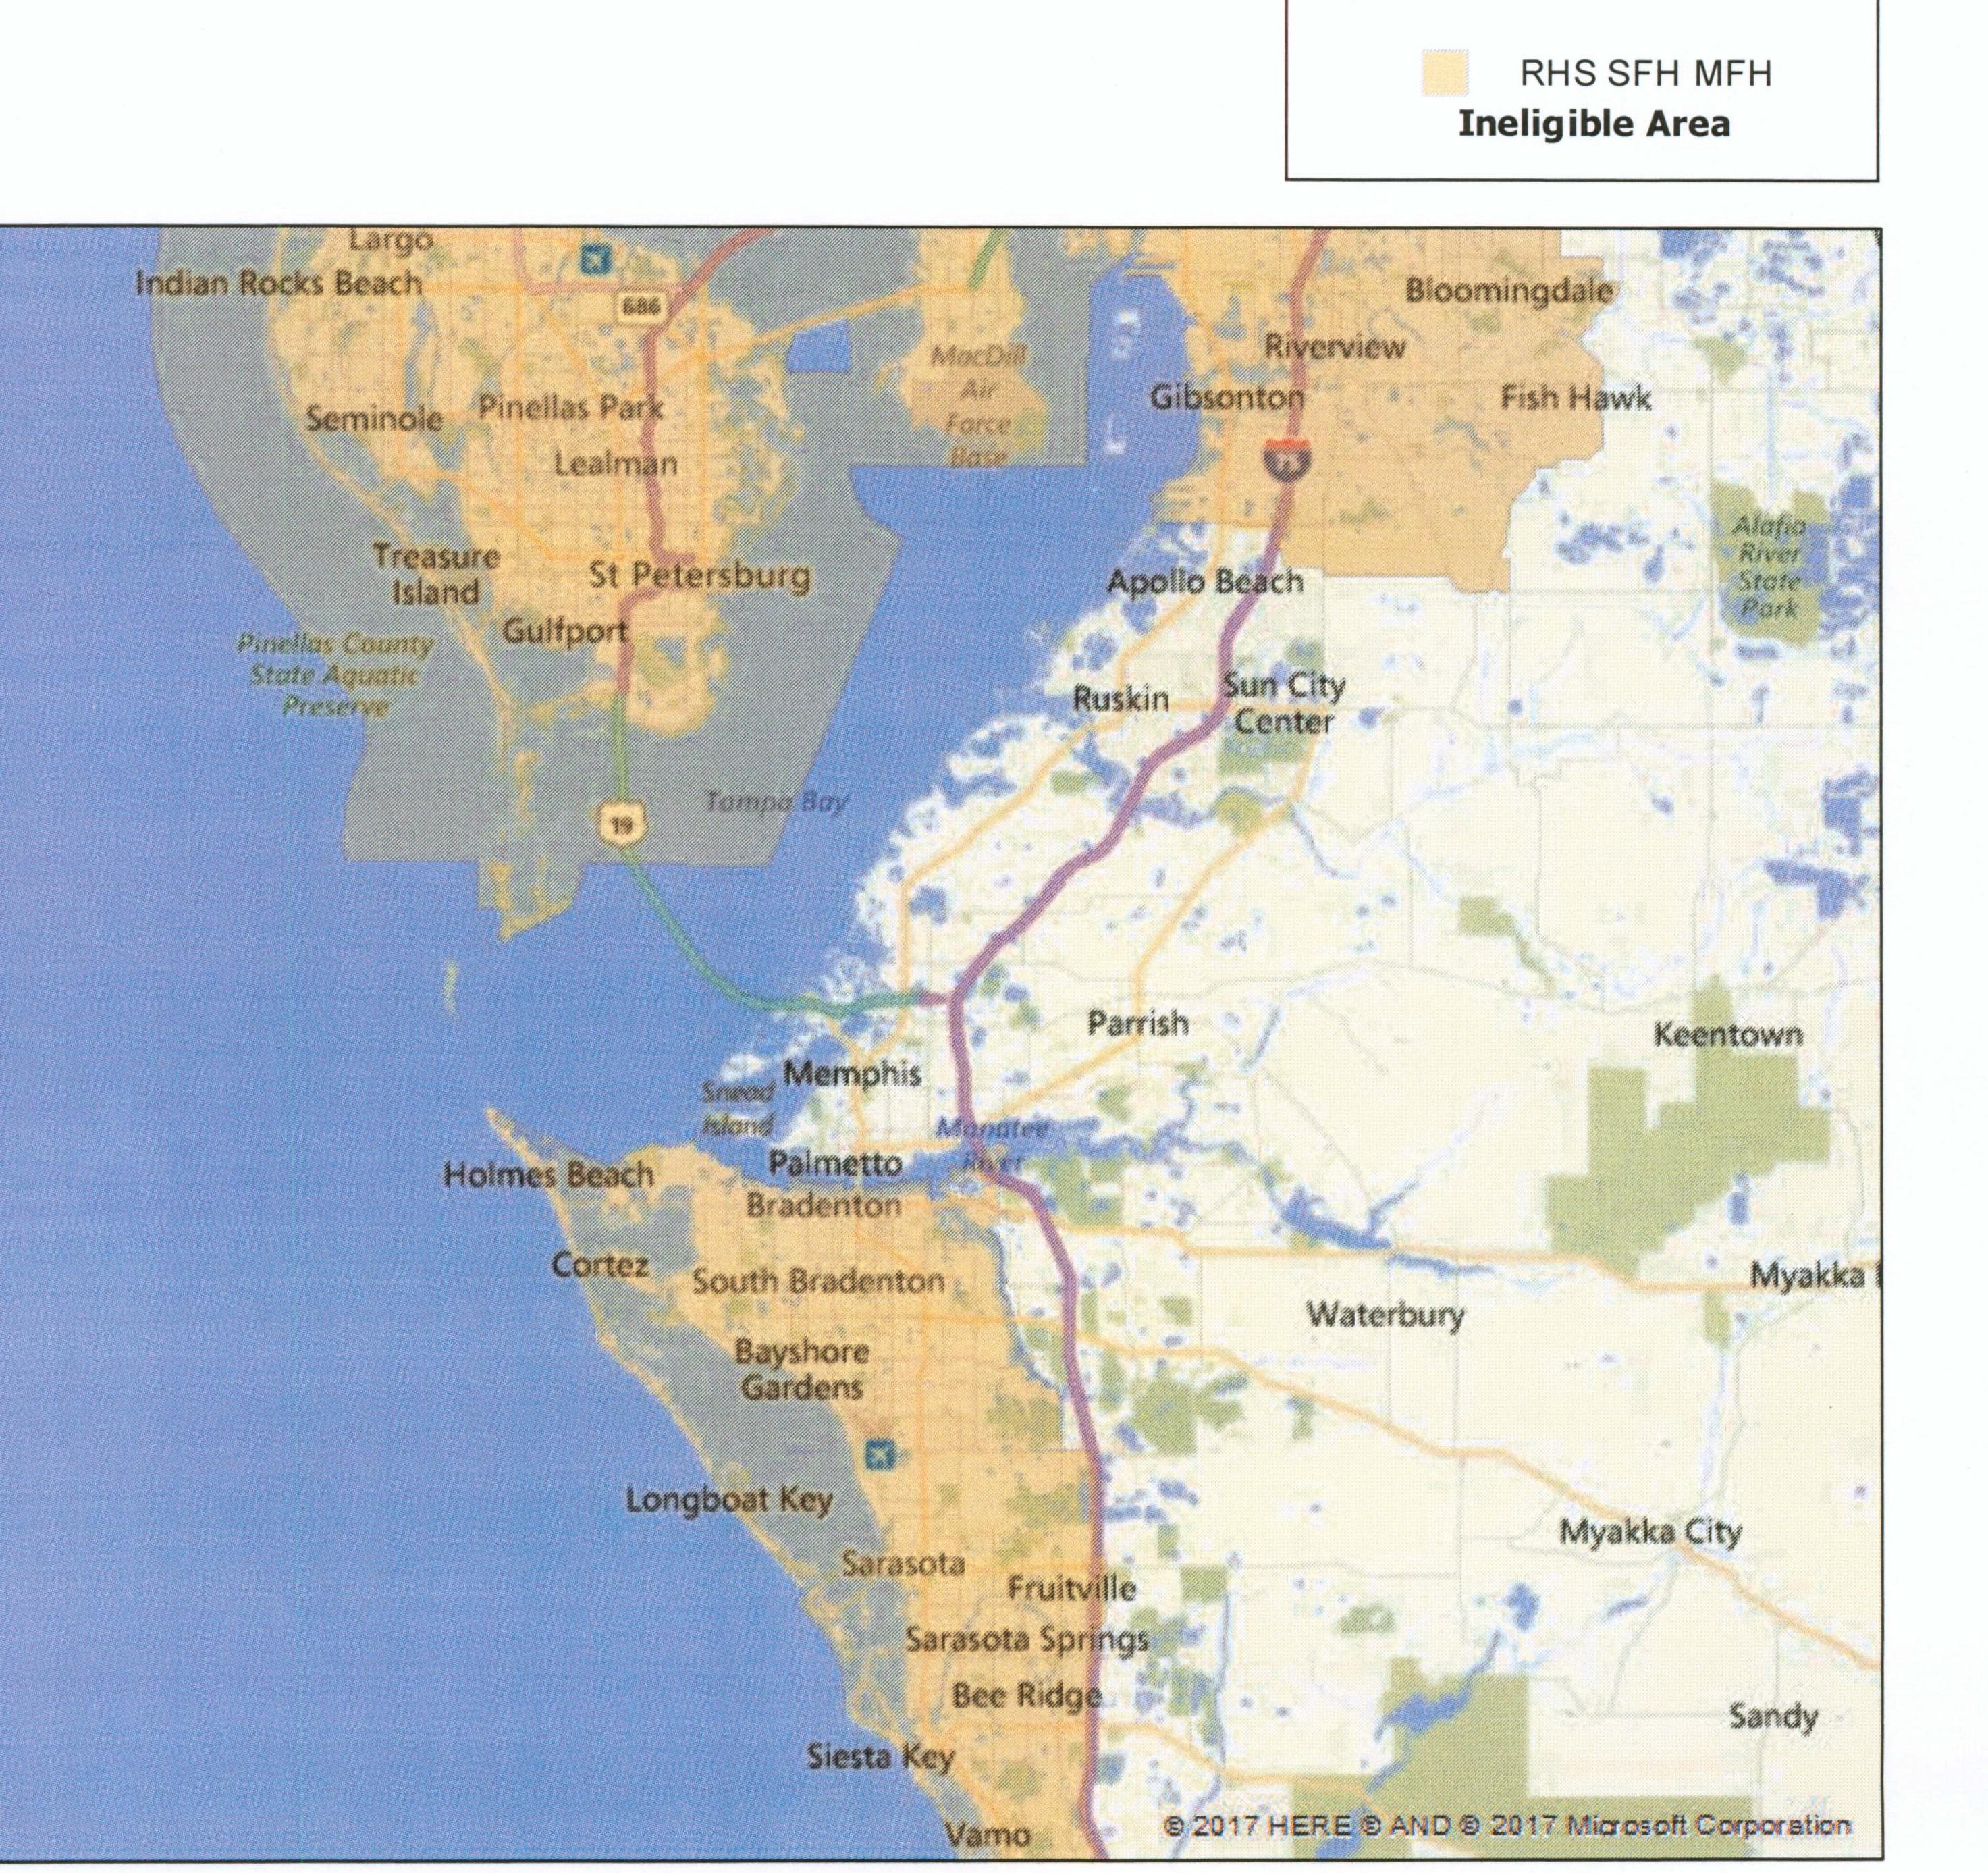 Usda Loan | Multiline Mortgage | (941) 201-9111 | Multiline Mortgage - Usda Loan Map Florida